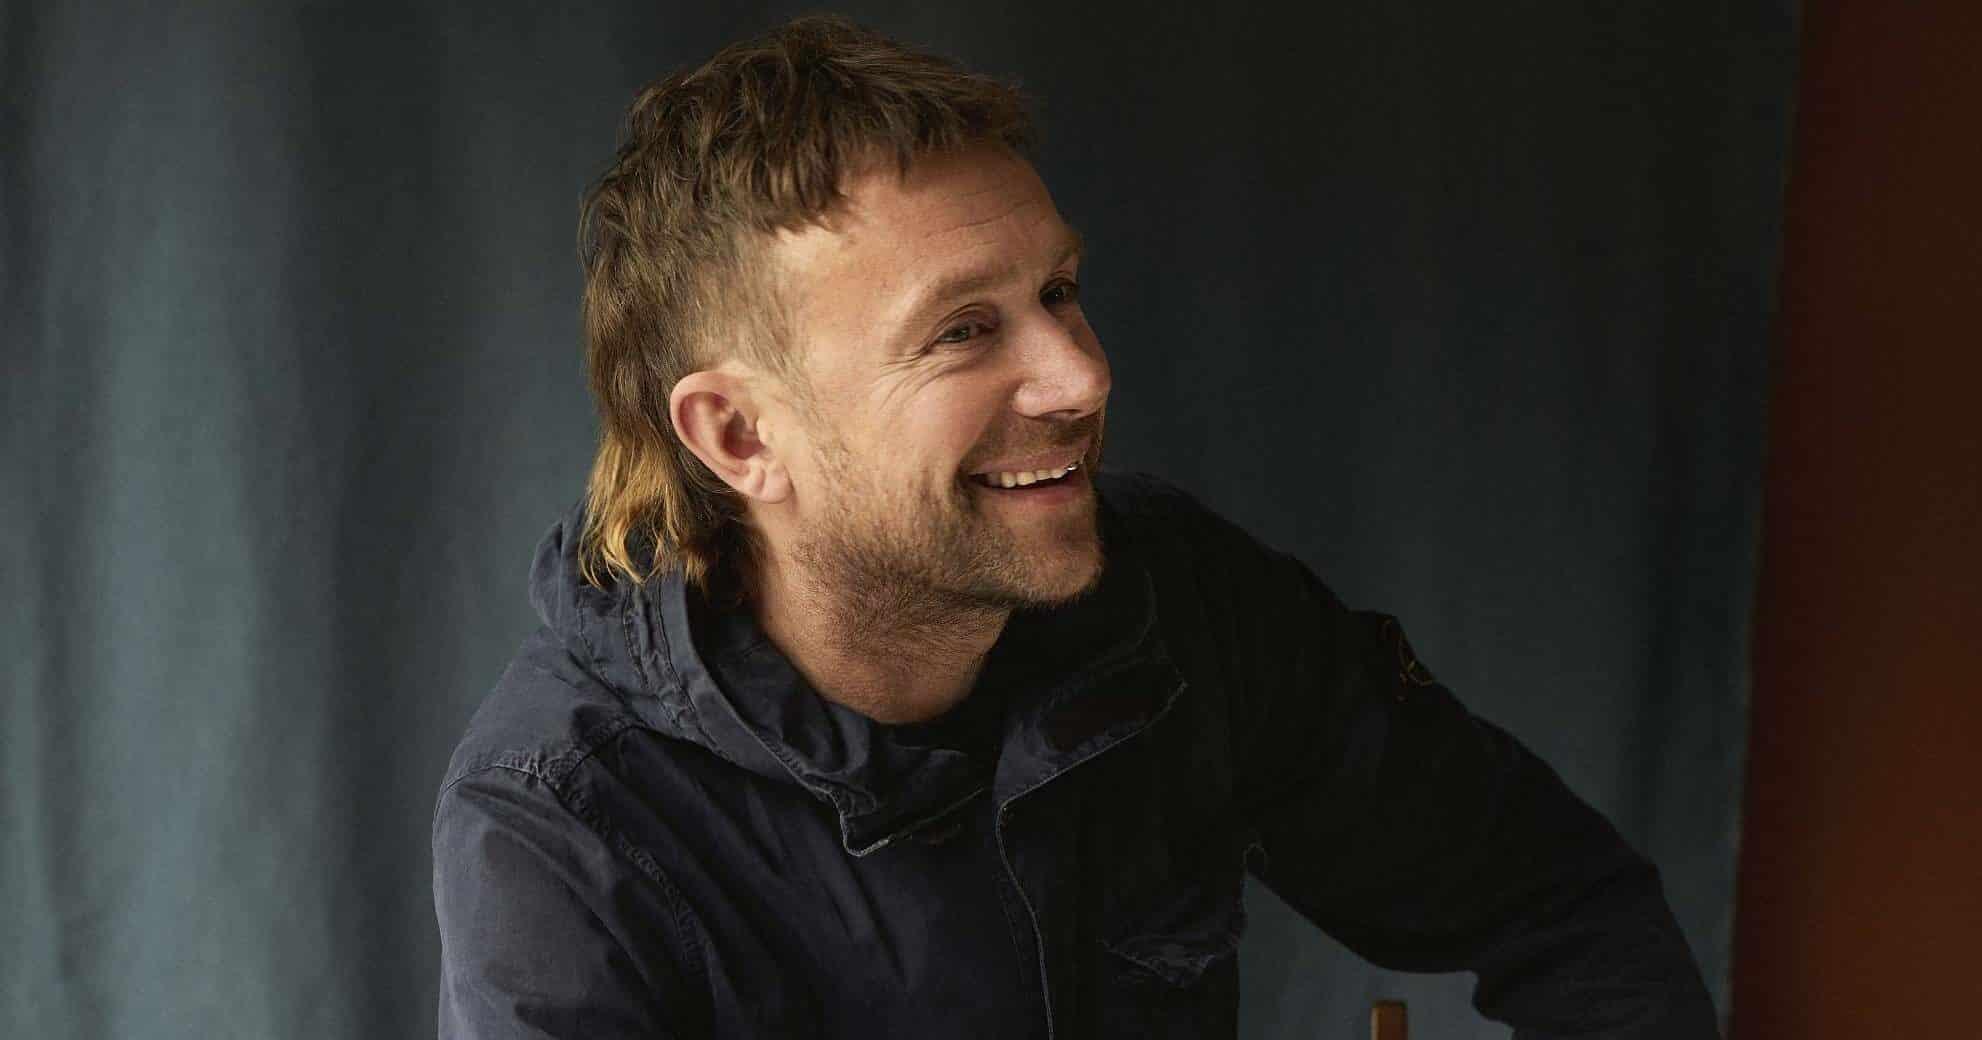 Damon Albarn Shares New Song 'The Tower of Montevideo'